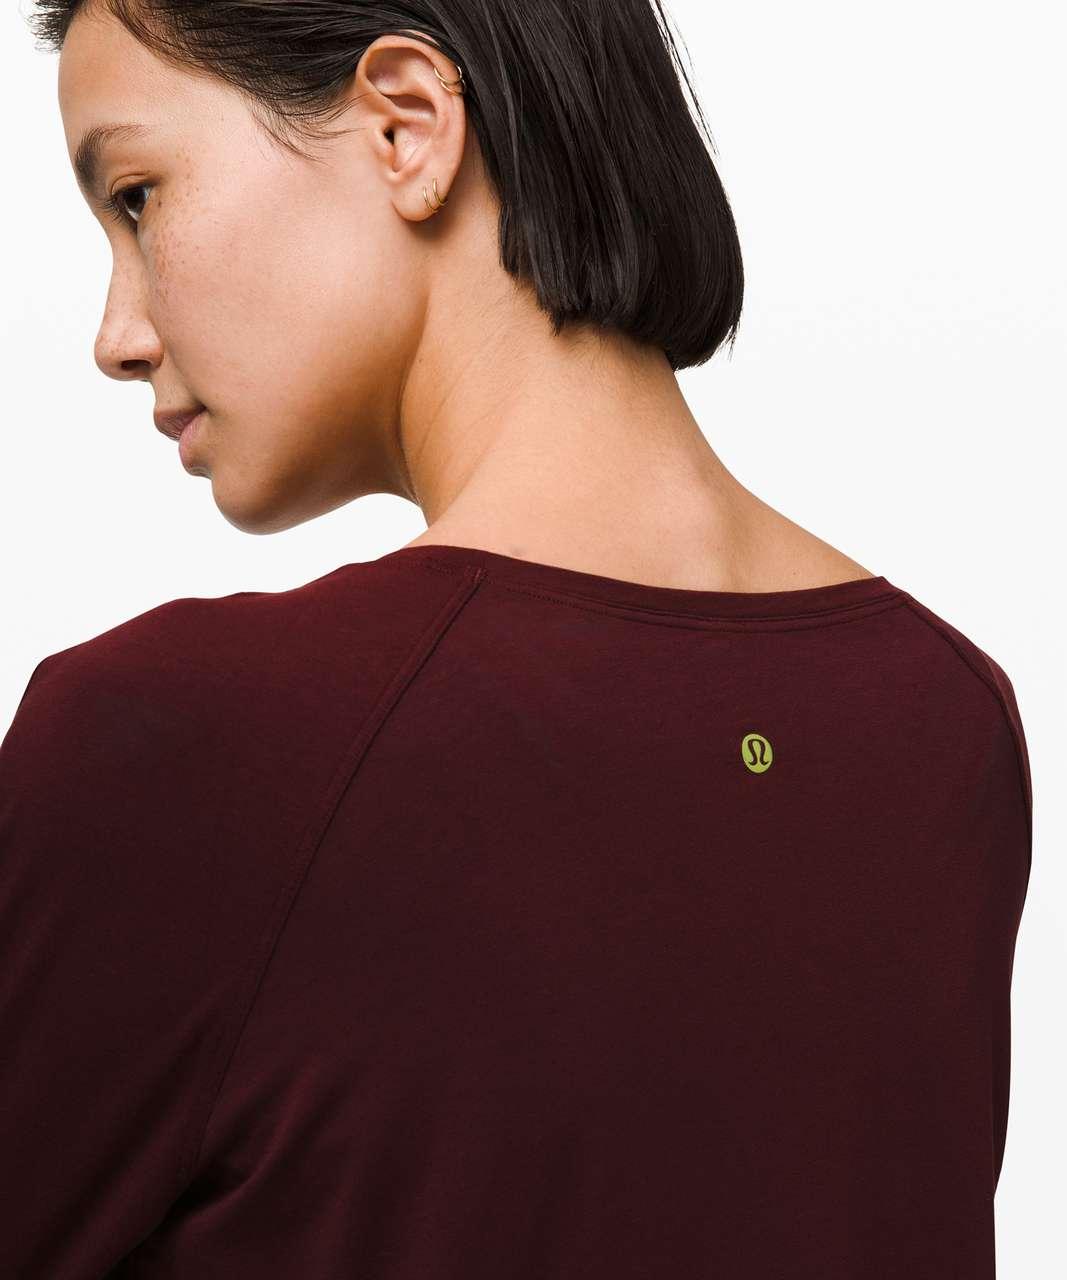 Lululemon Emerald Long Sleeve *Lunar New Year - Garnet